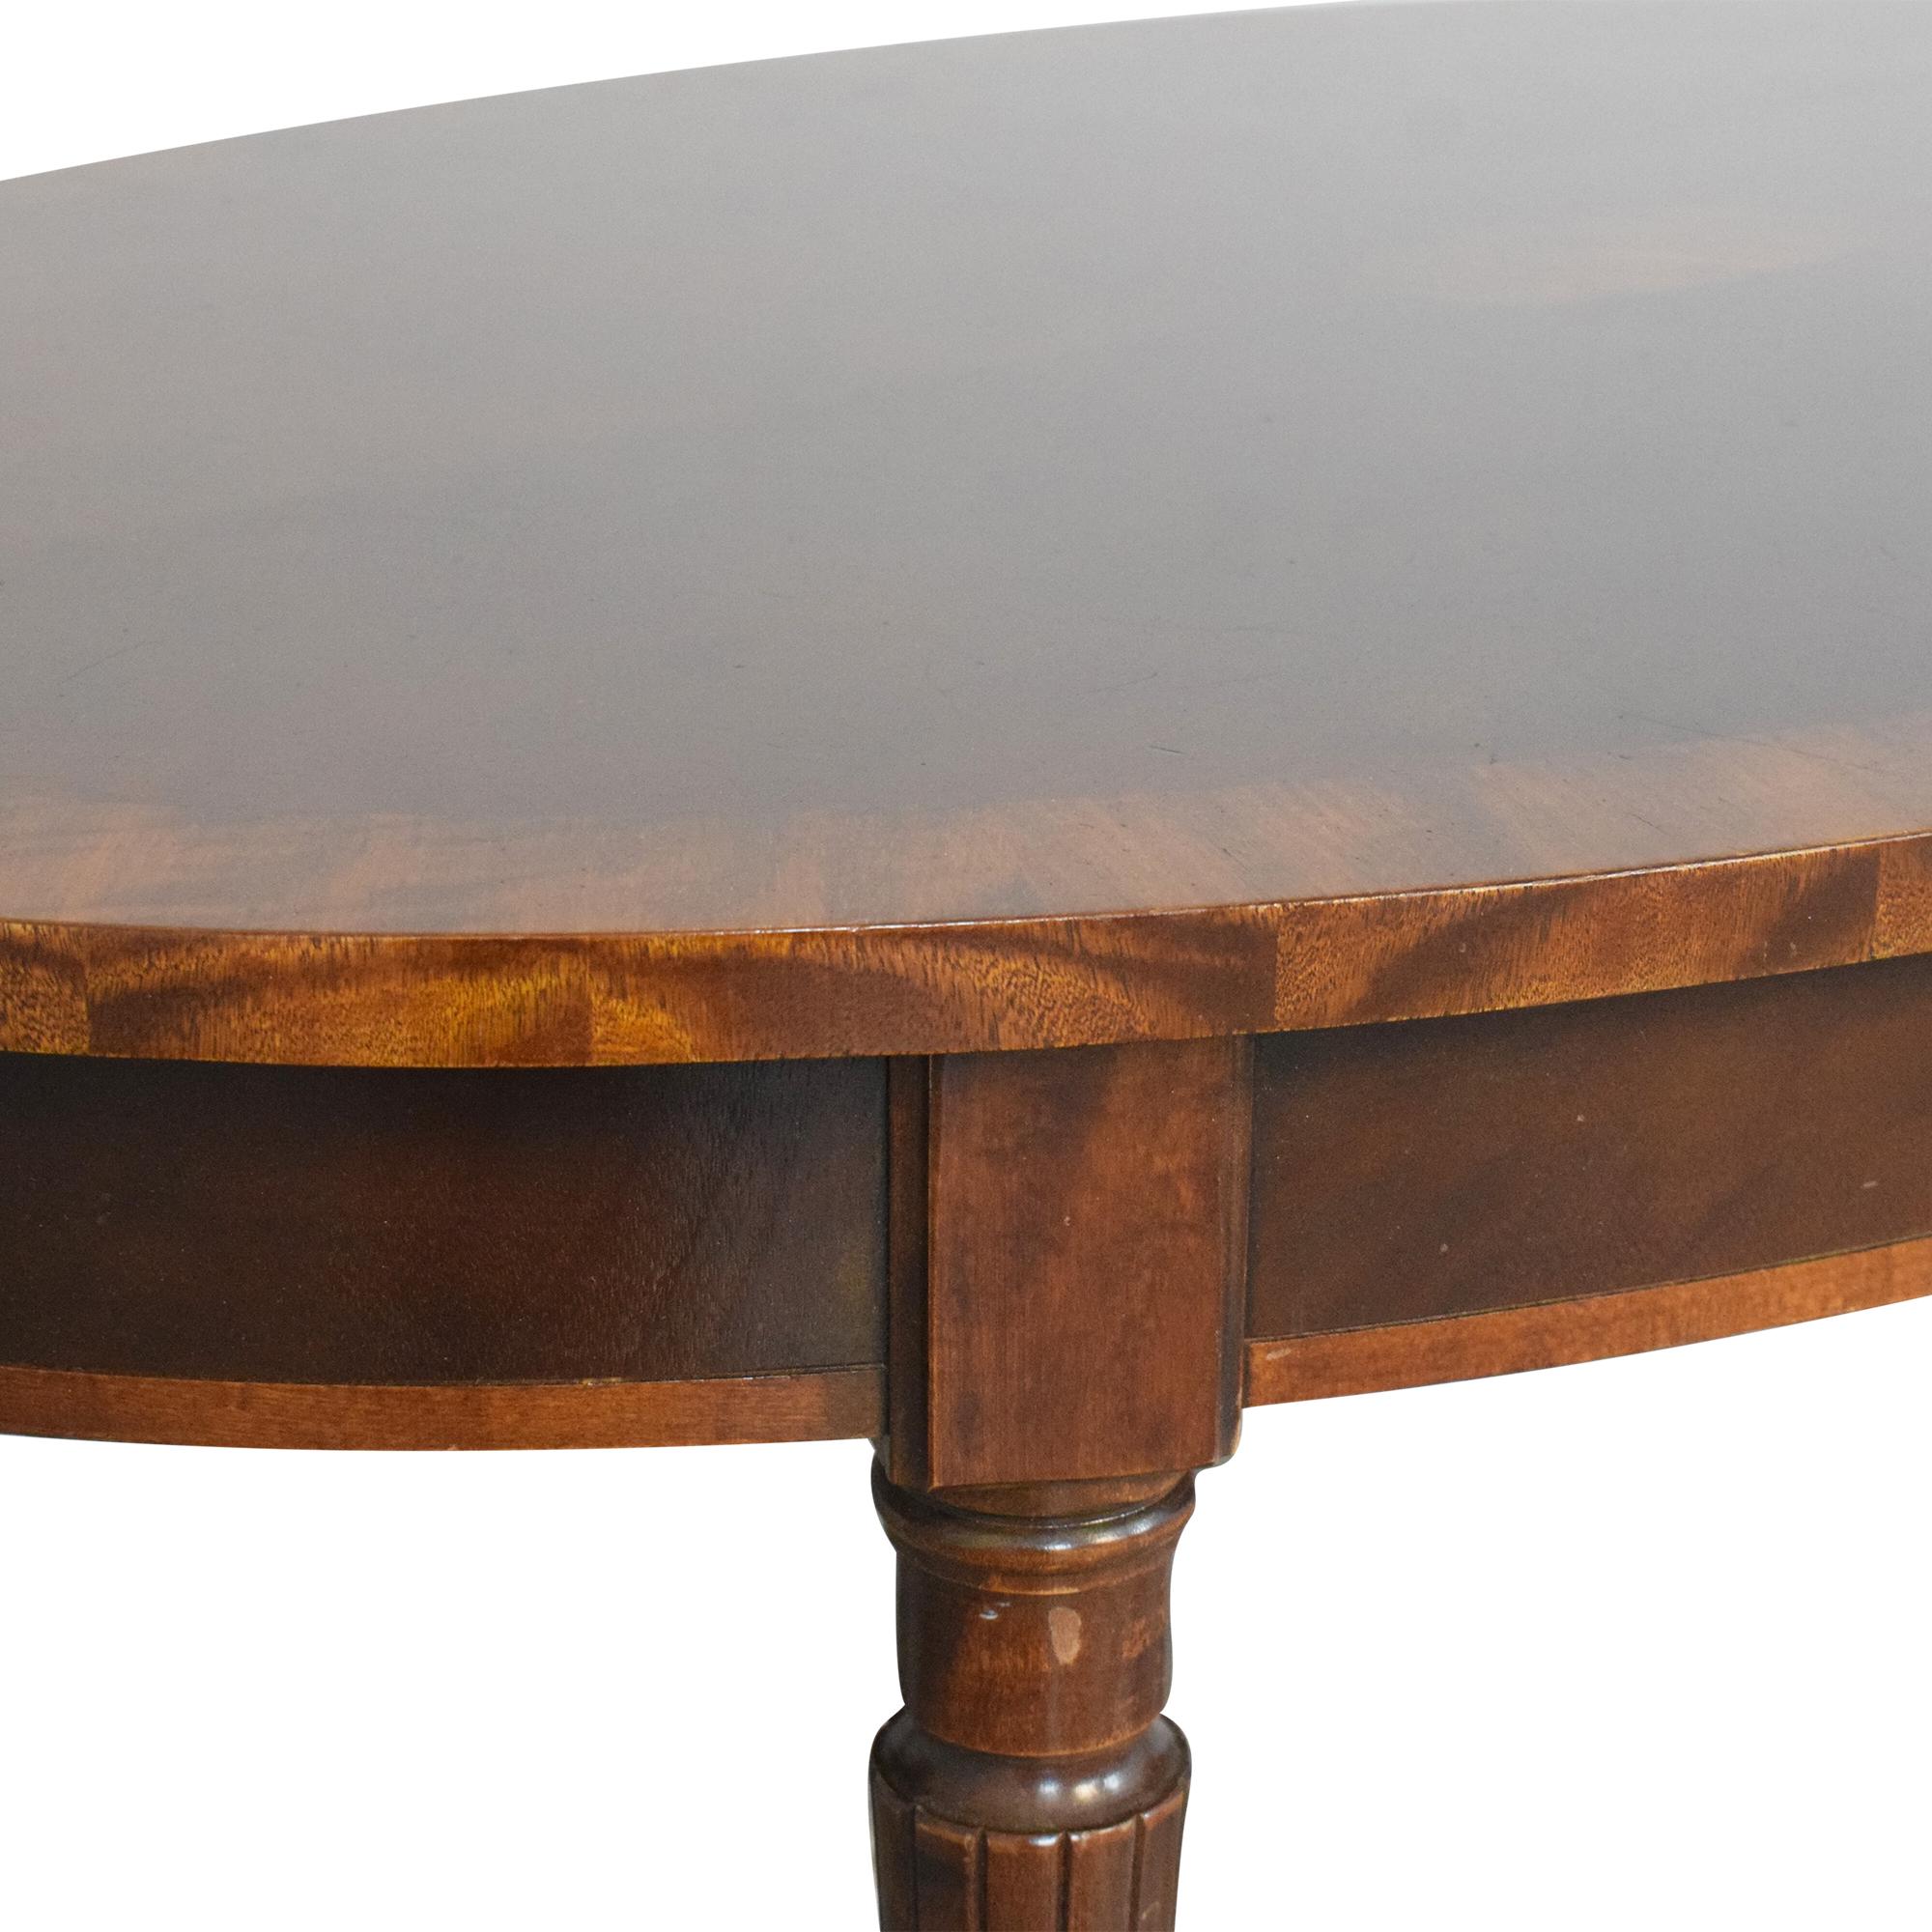 Henredon Furniture Henredon Oval Coffee Table Coffee Tables